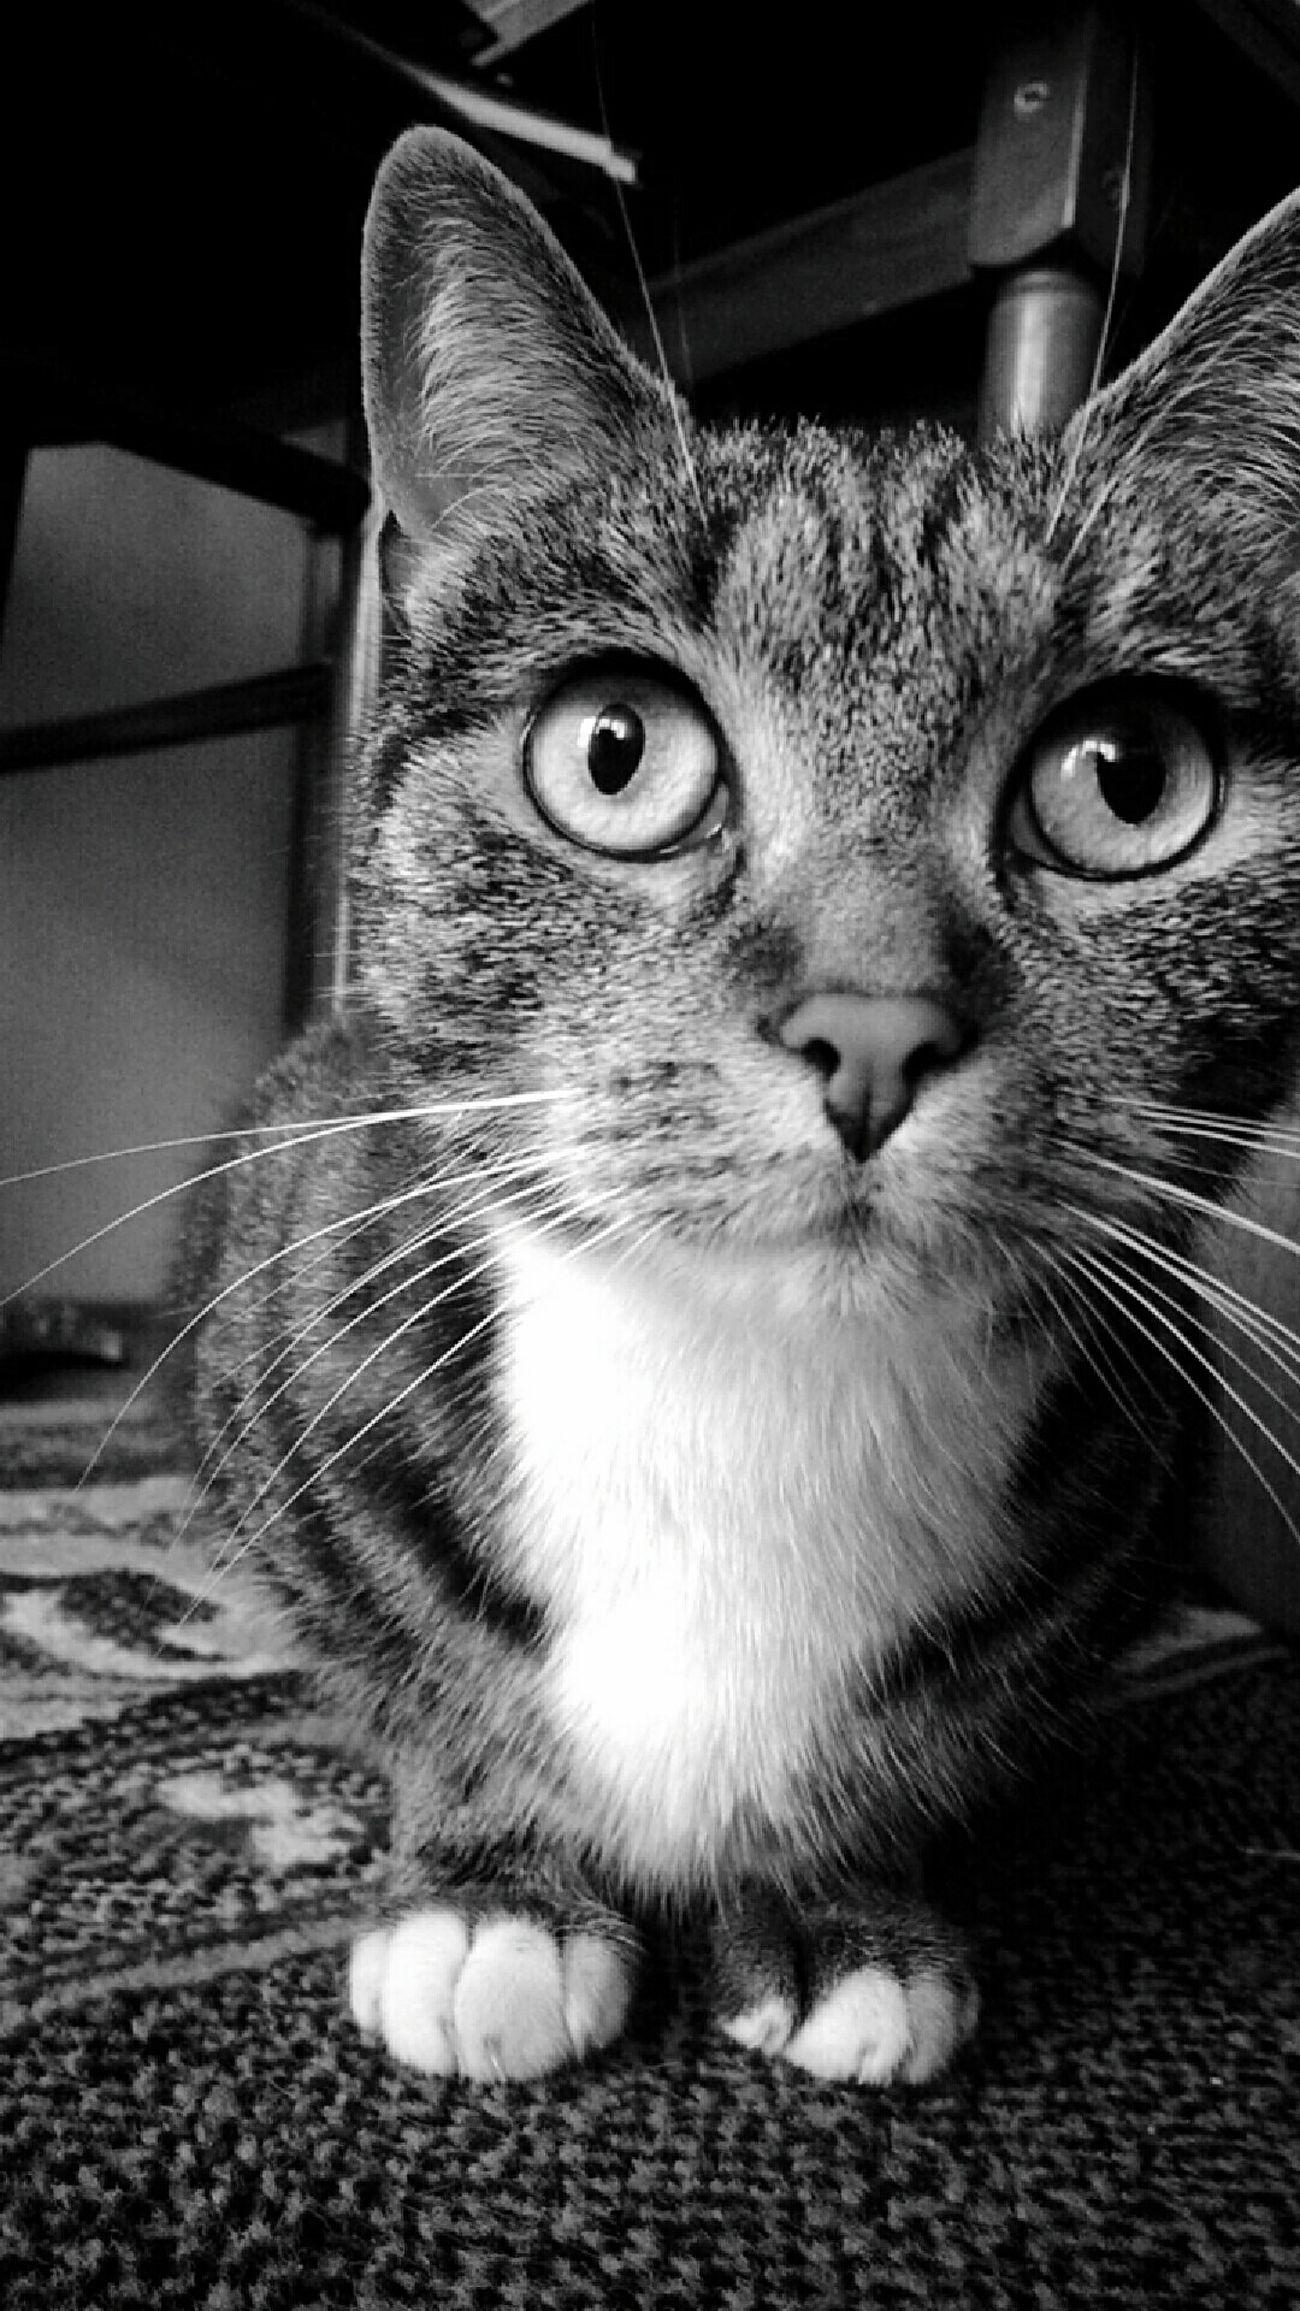 Moja słodka kotka 😸💕 Black And White Black And White Photography Cat Princess Cat Cateyes Cat Photography I Love My Pet Cats Of EyeEm Cat Eyes Cat Watching I Love My Cat EyeEm Gallery EyeEm Animal Eye Cat♡ Calypso